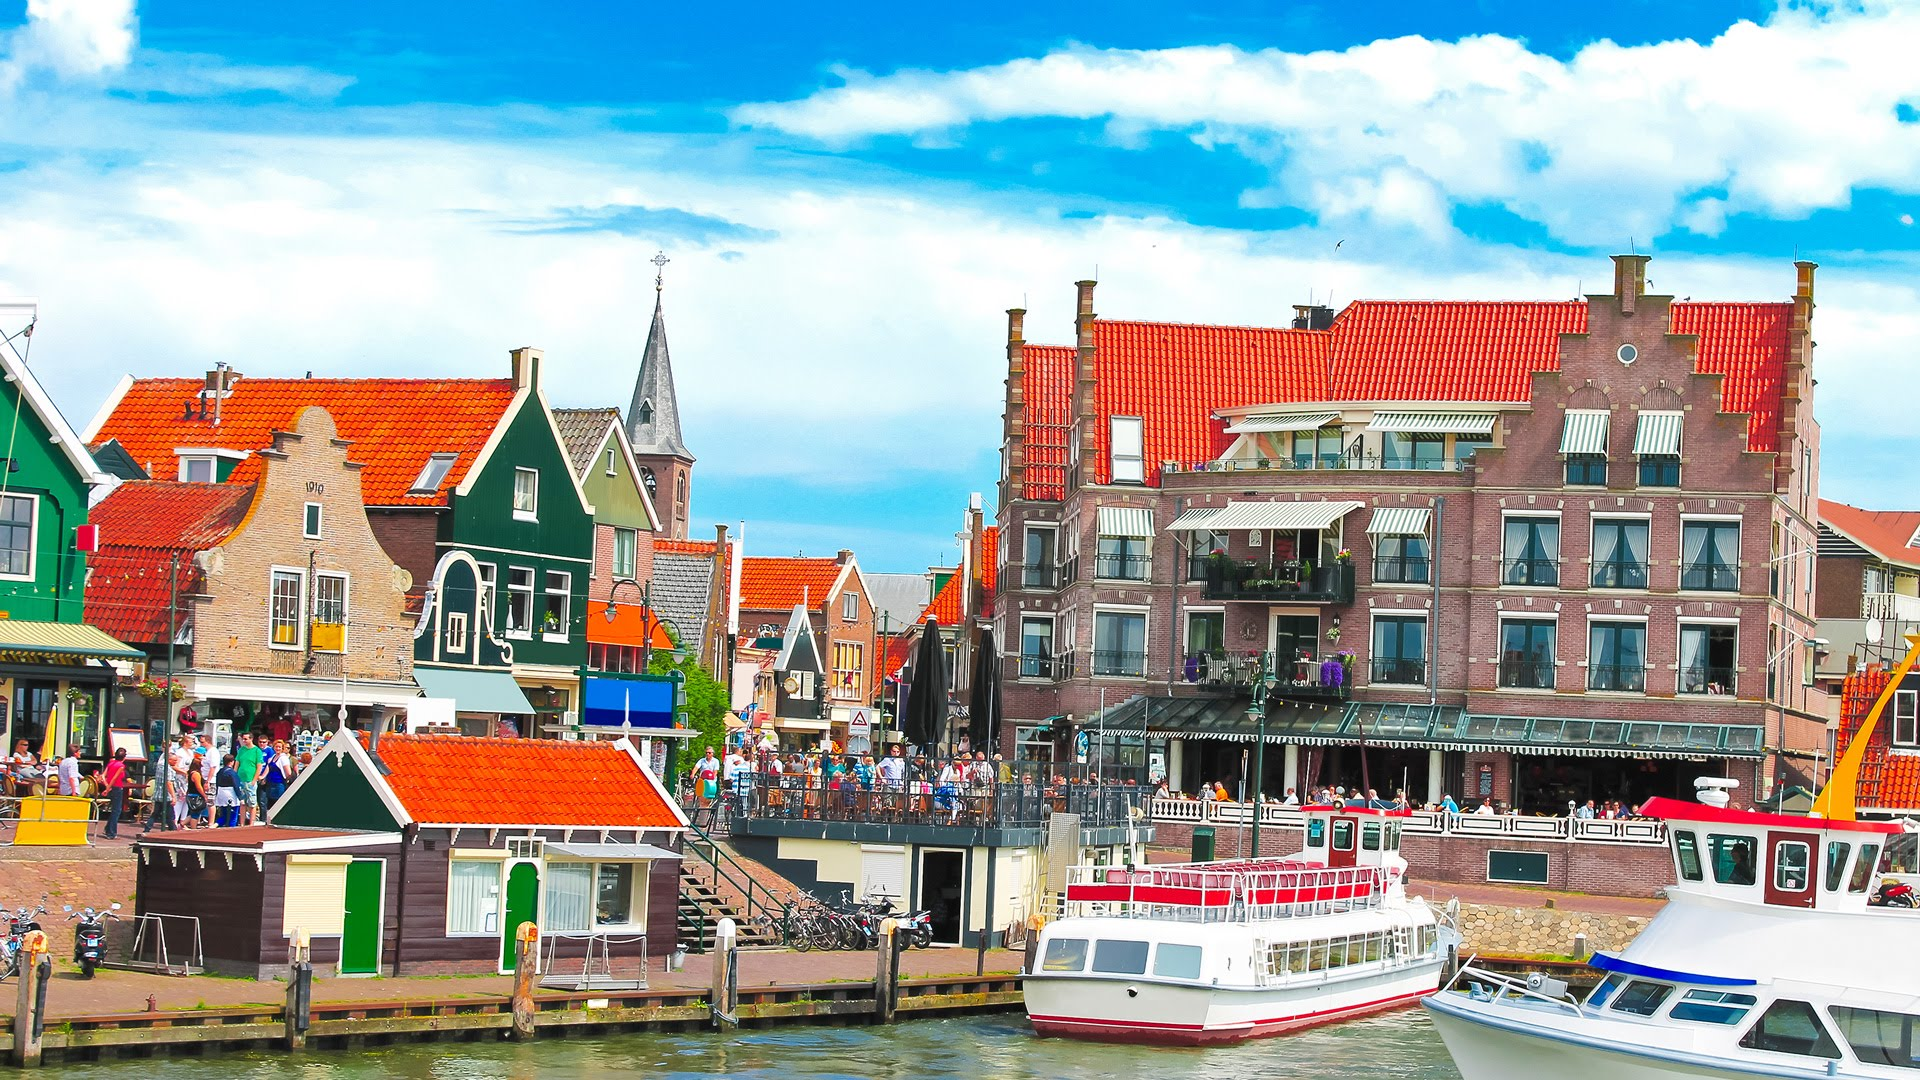 Volendam, Desa Tradisional nan Eksotis di Amsterdam